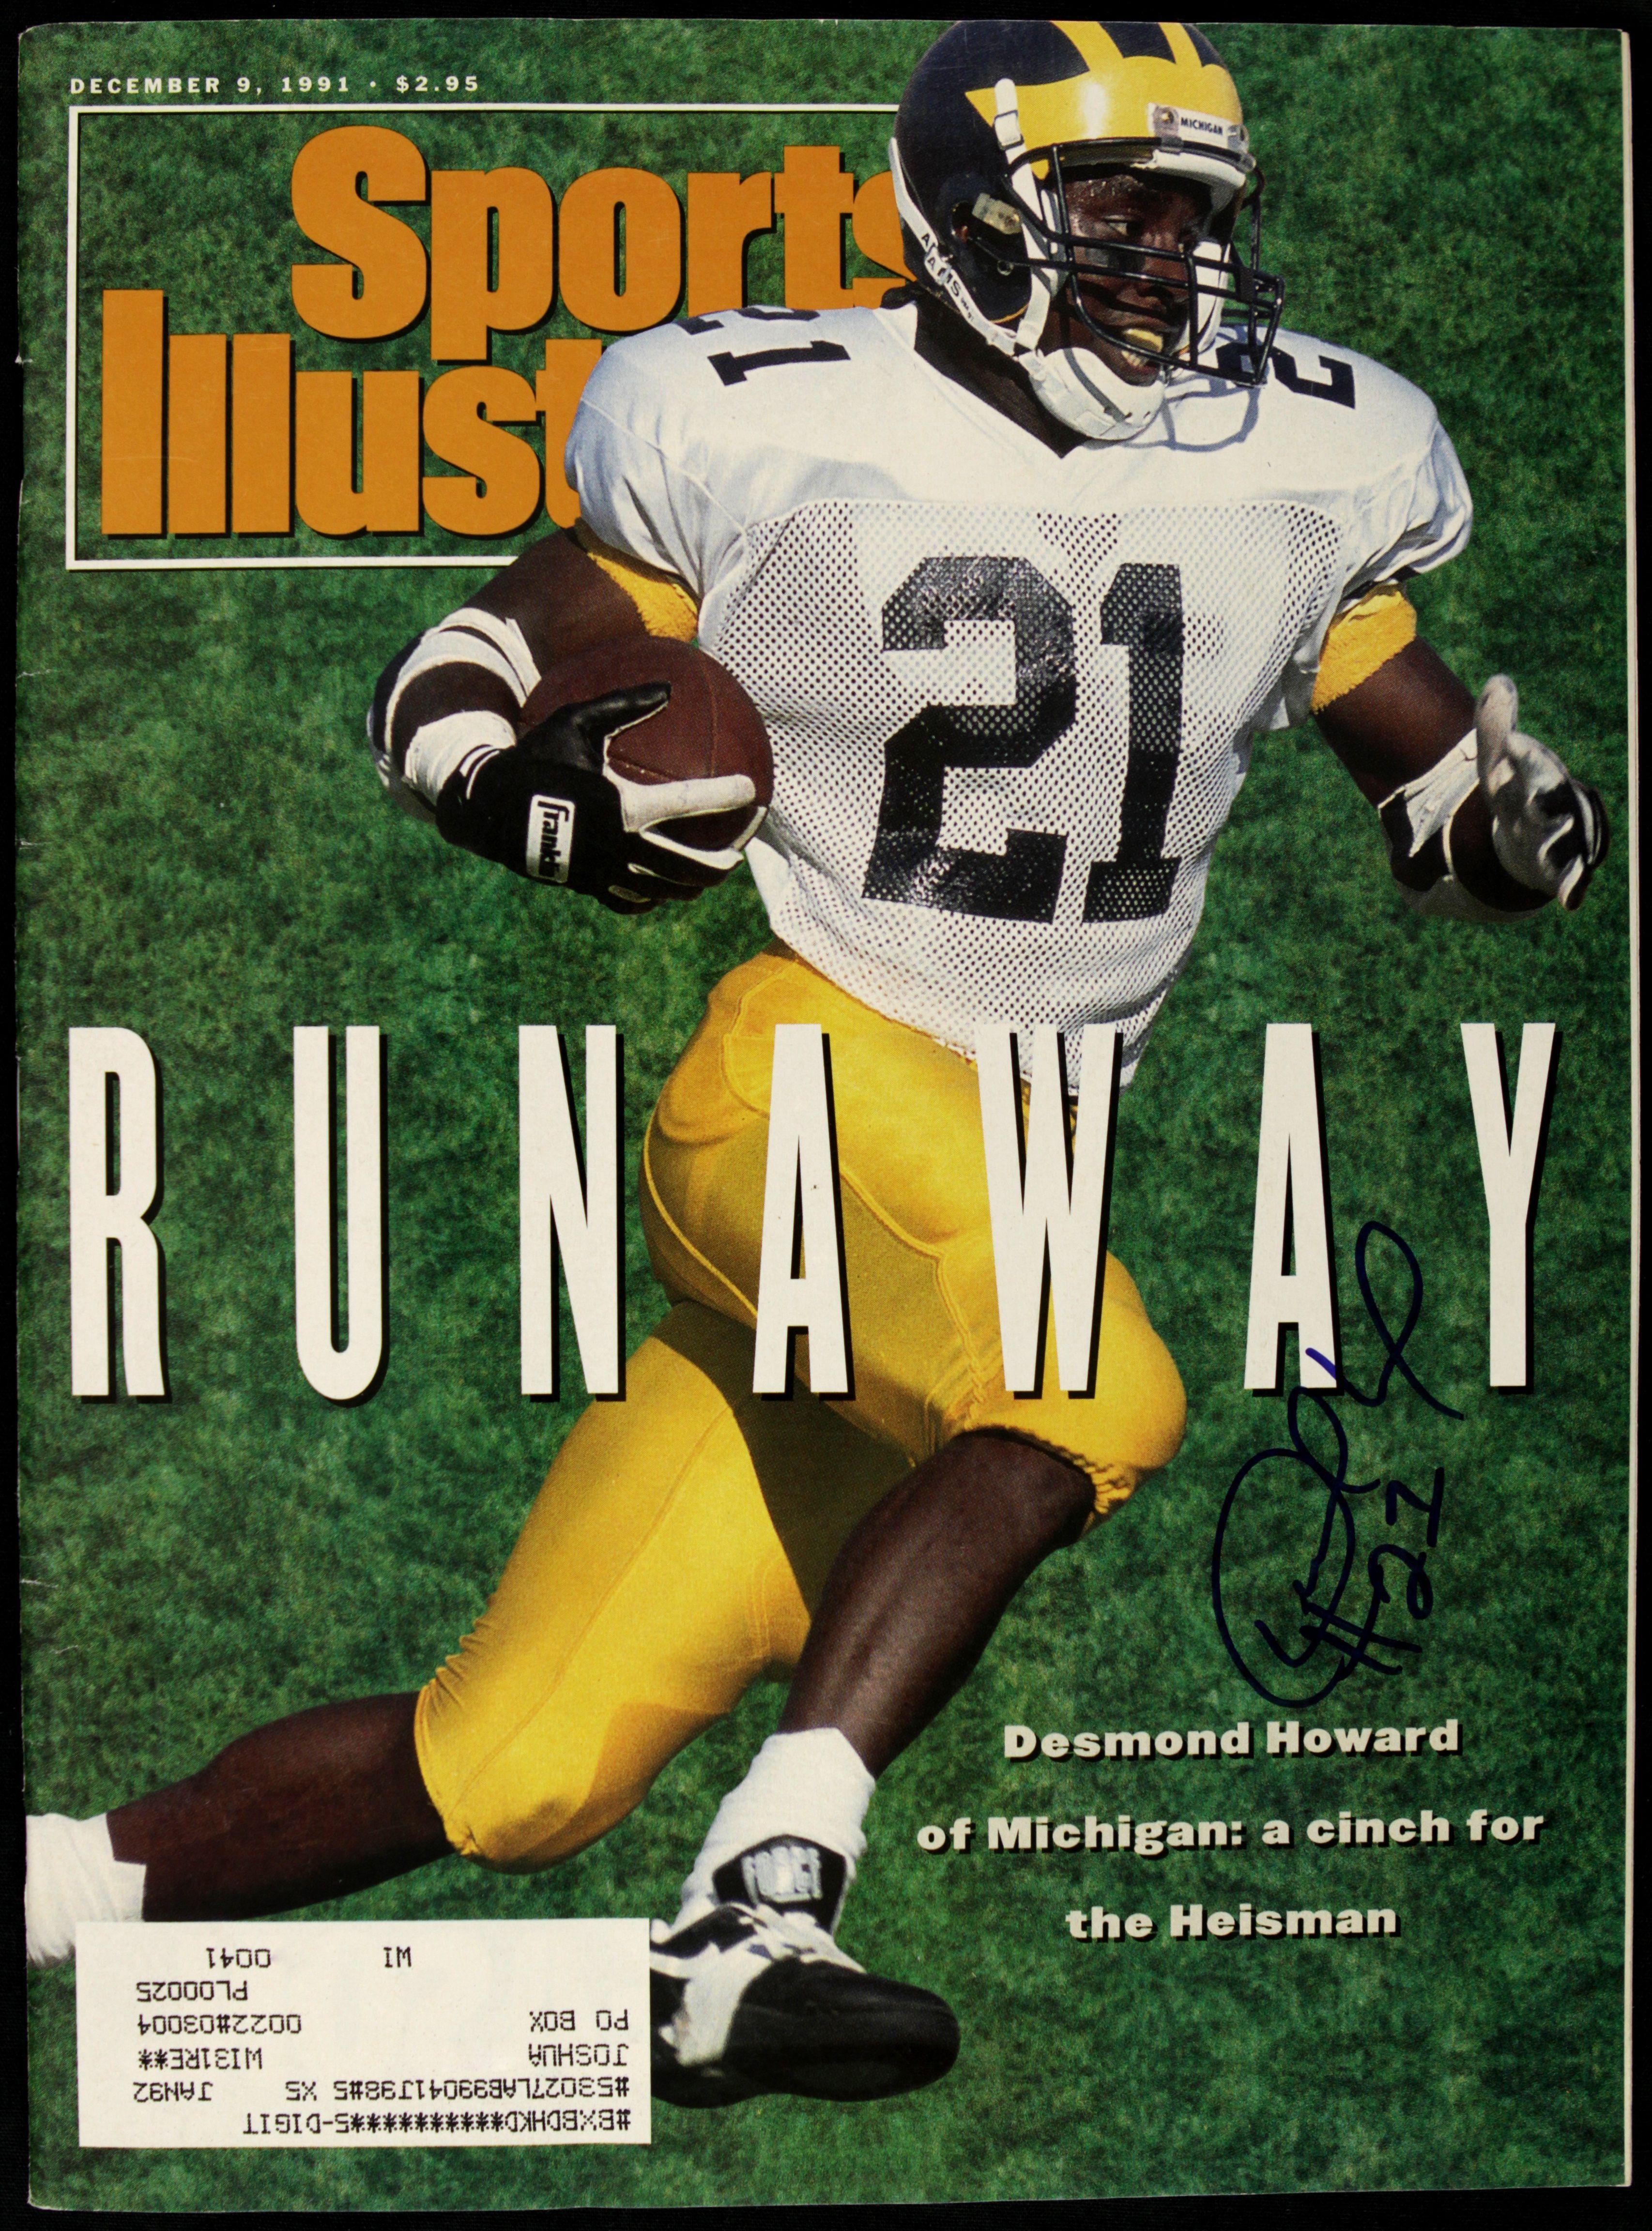 60160a Lg Jpeg 3412 4608 Sports Magazine Covers Desmond Howard Sports Illustrated